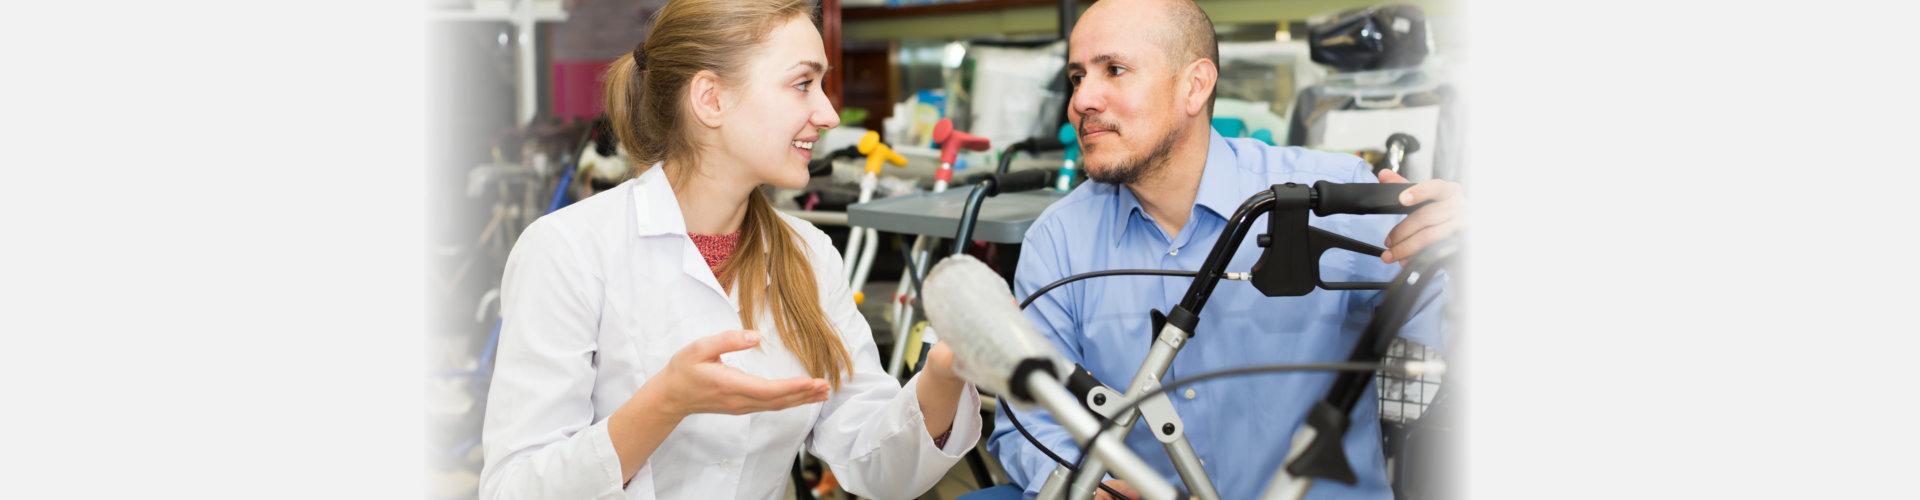 Female consultant offering wheelchair to smiling senior customer